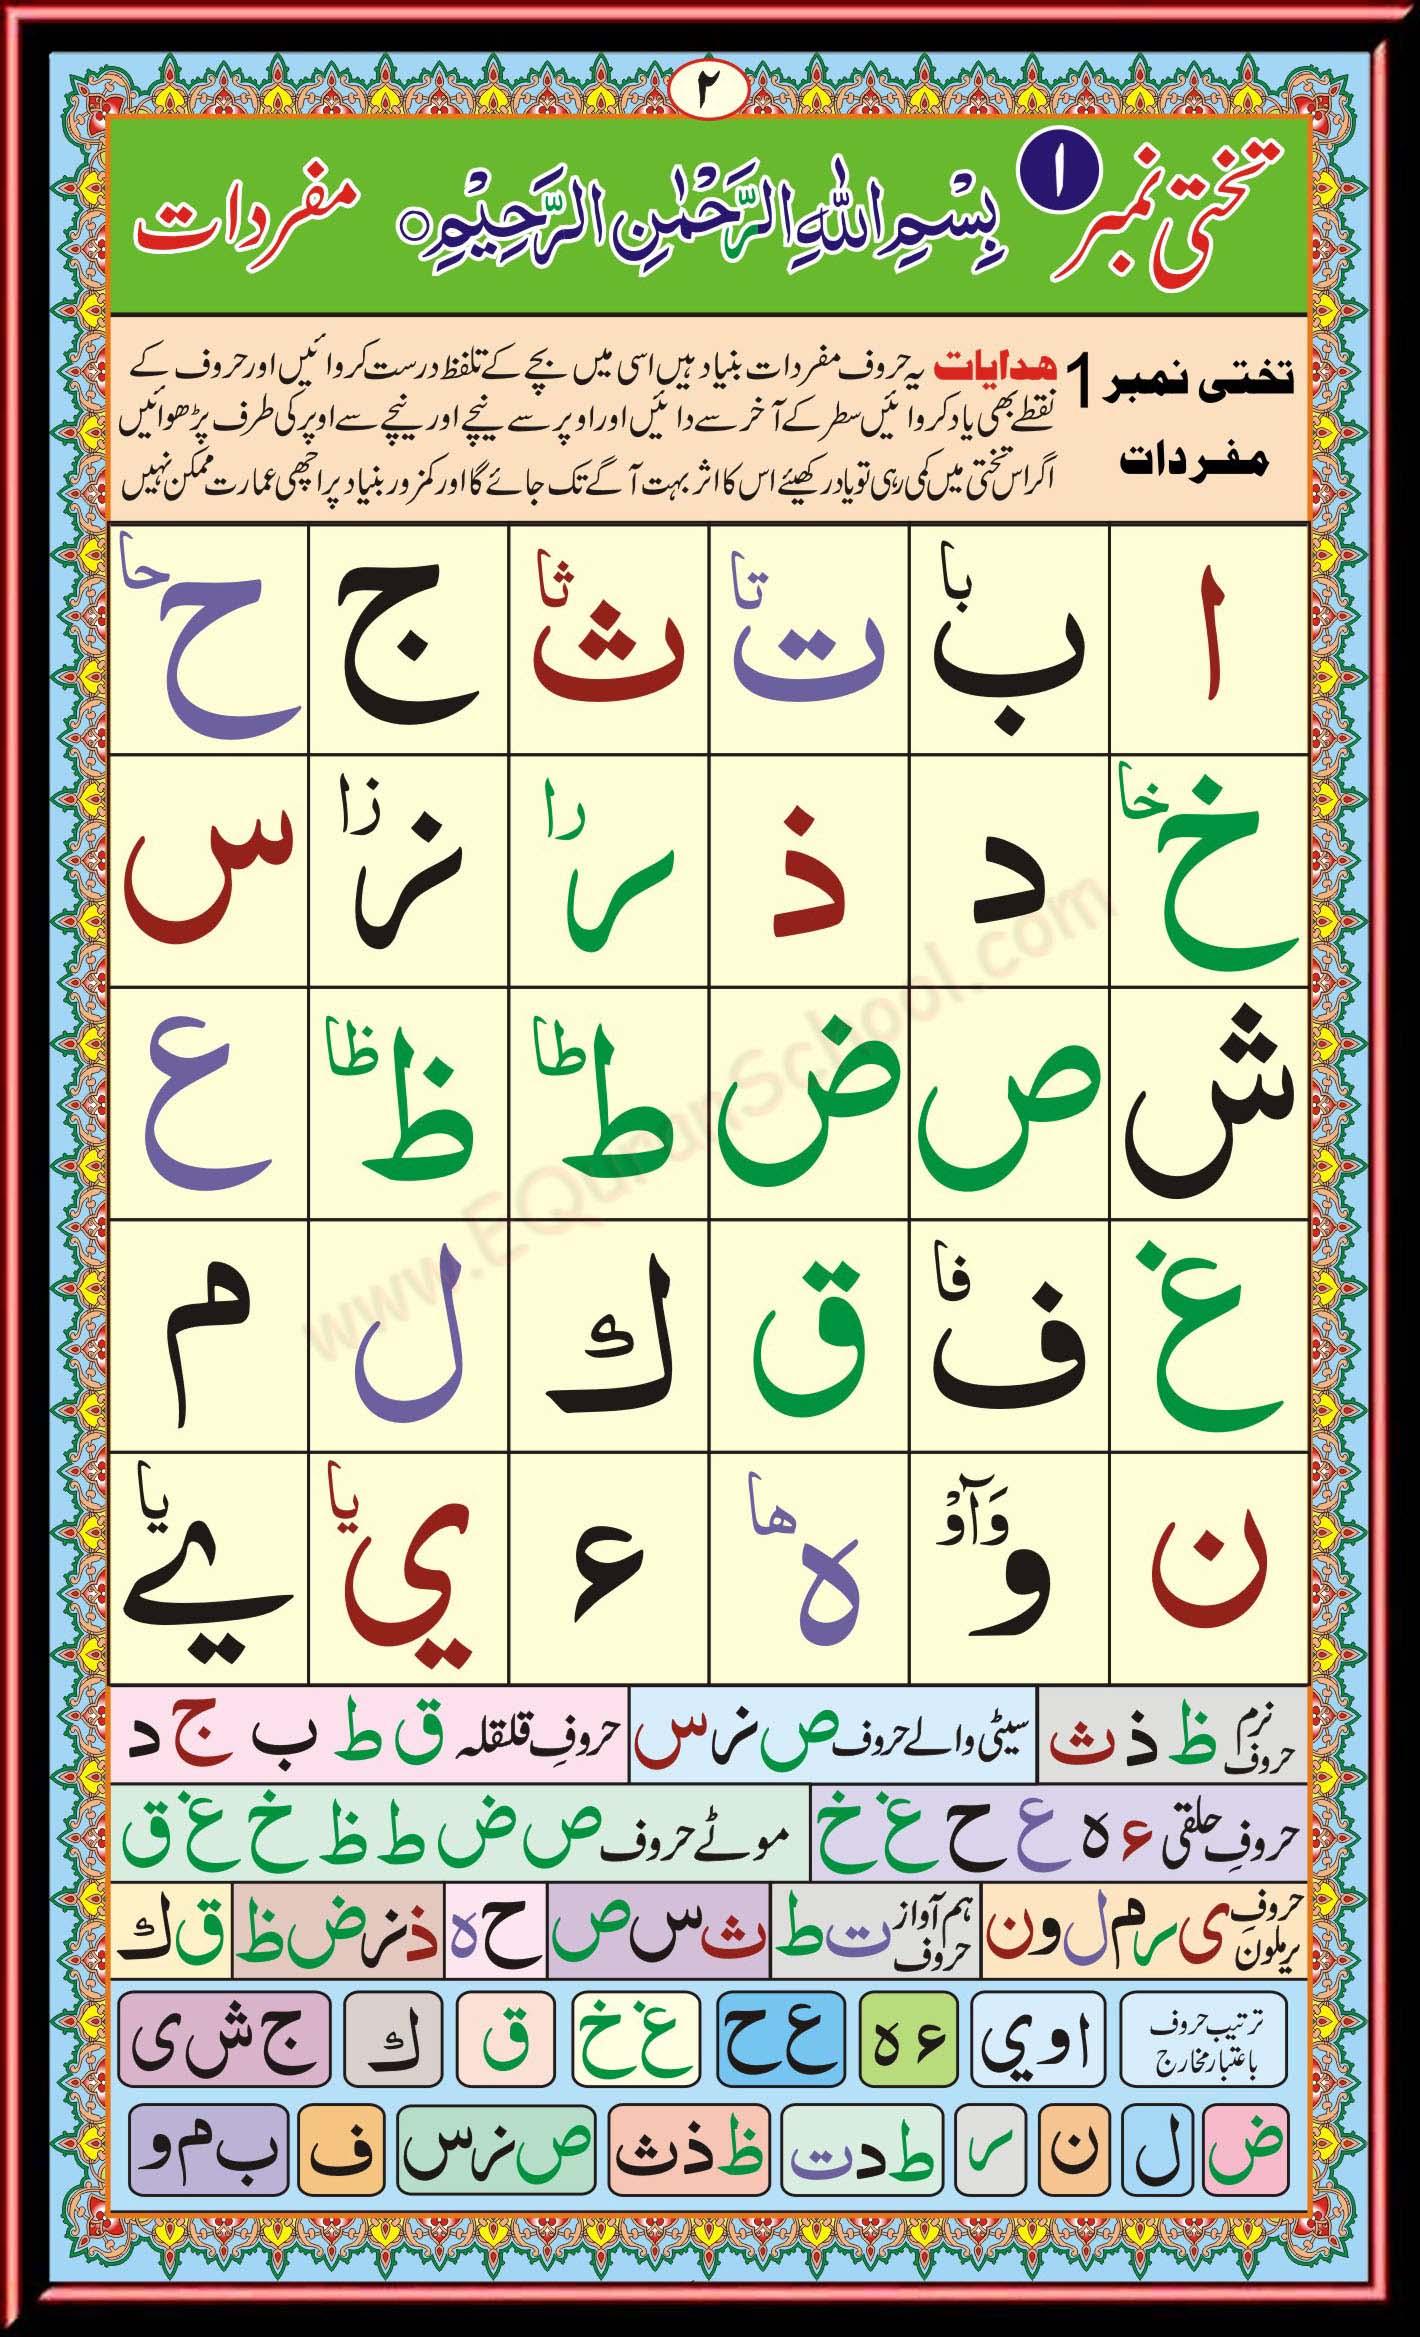 Alif Ba Ta Sa : Noorani, Qaida, Lesson, Basic, Arabic, Alphabets,, Huroof, Mufridaat, Individual, Letters,, Makharij, English,, Tutorial